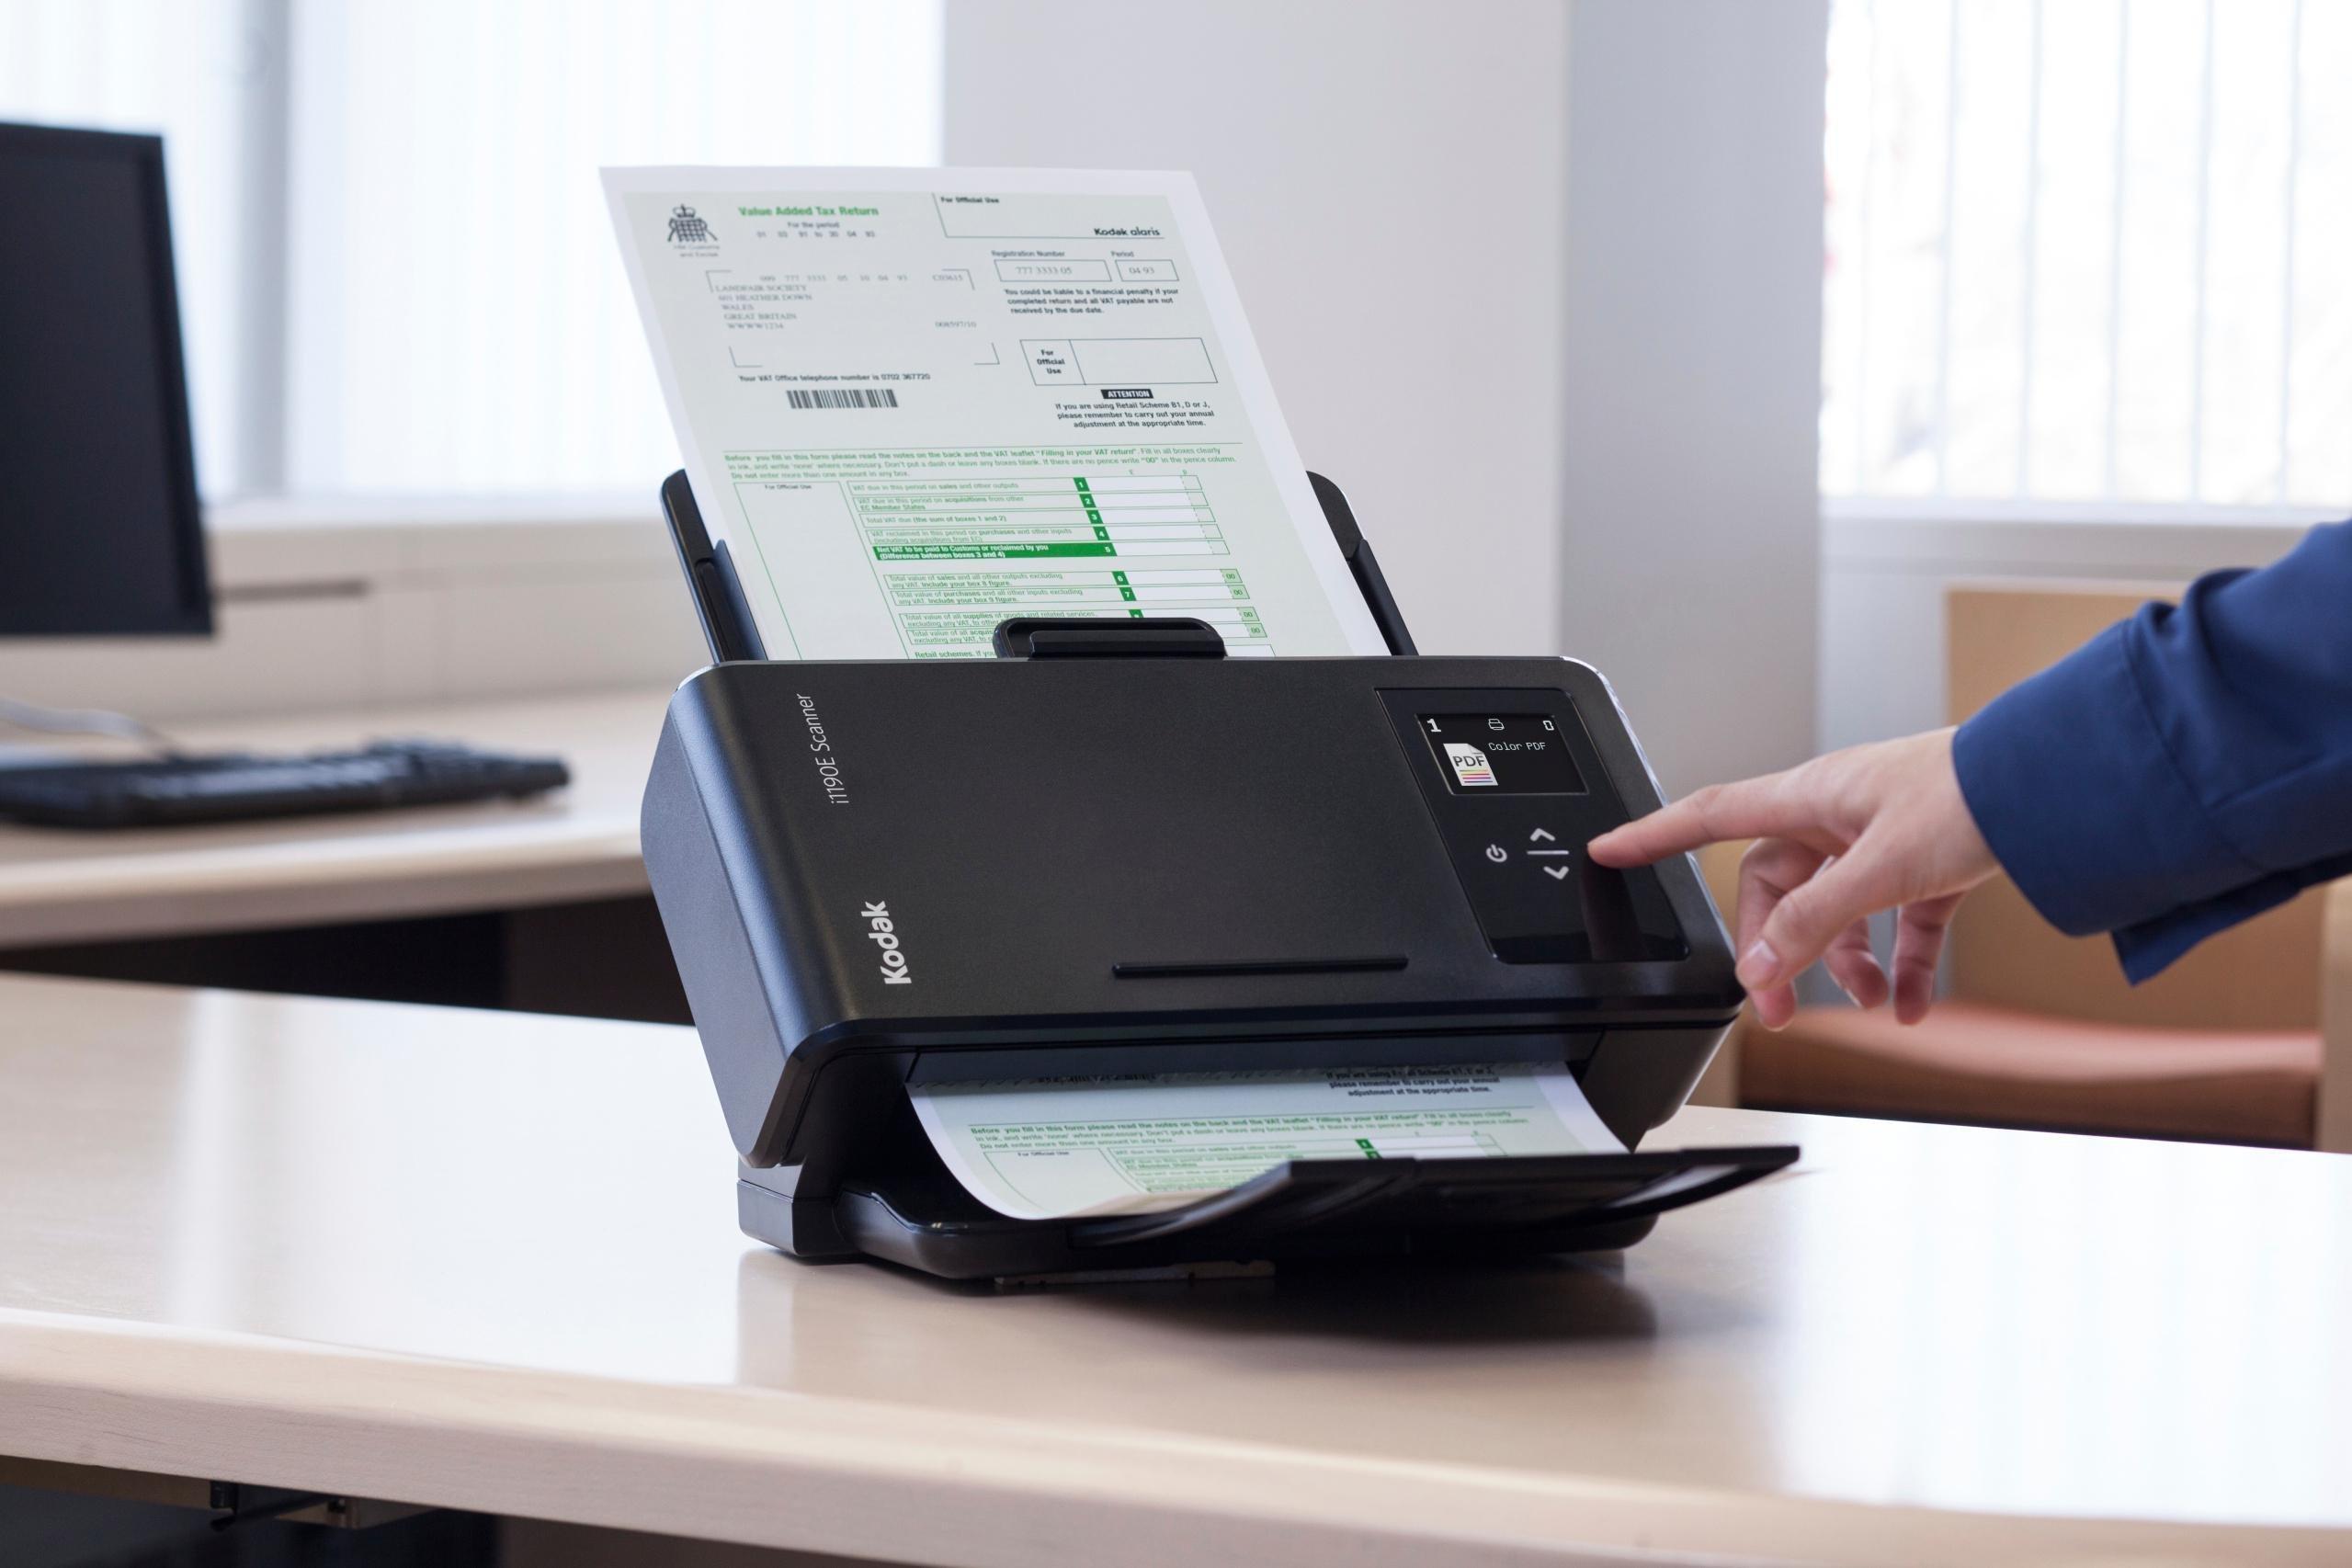 Kodak i1190 Scanner DIN A4 Dokumentenscanner mit 40 Amazon